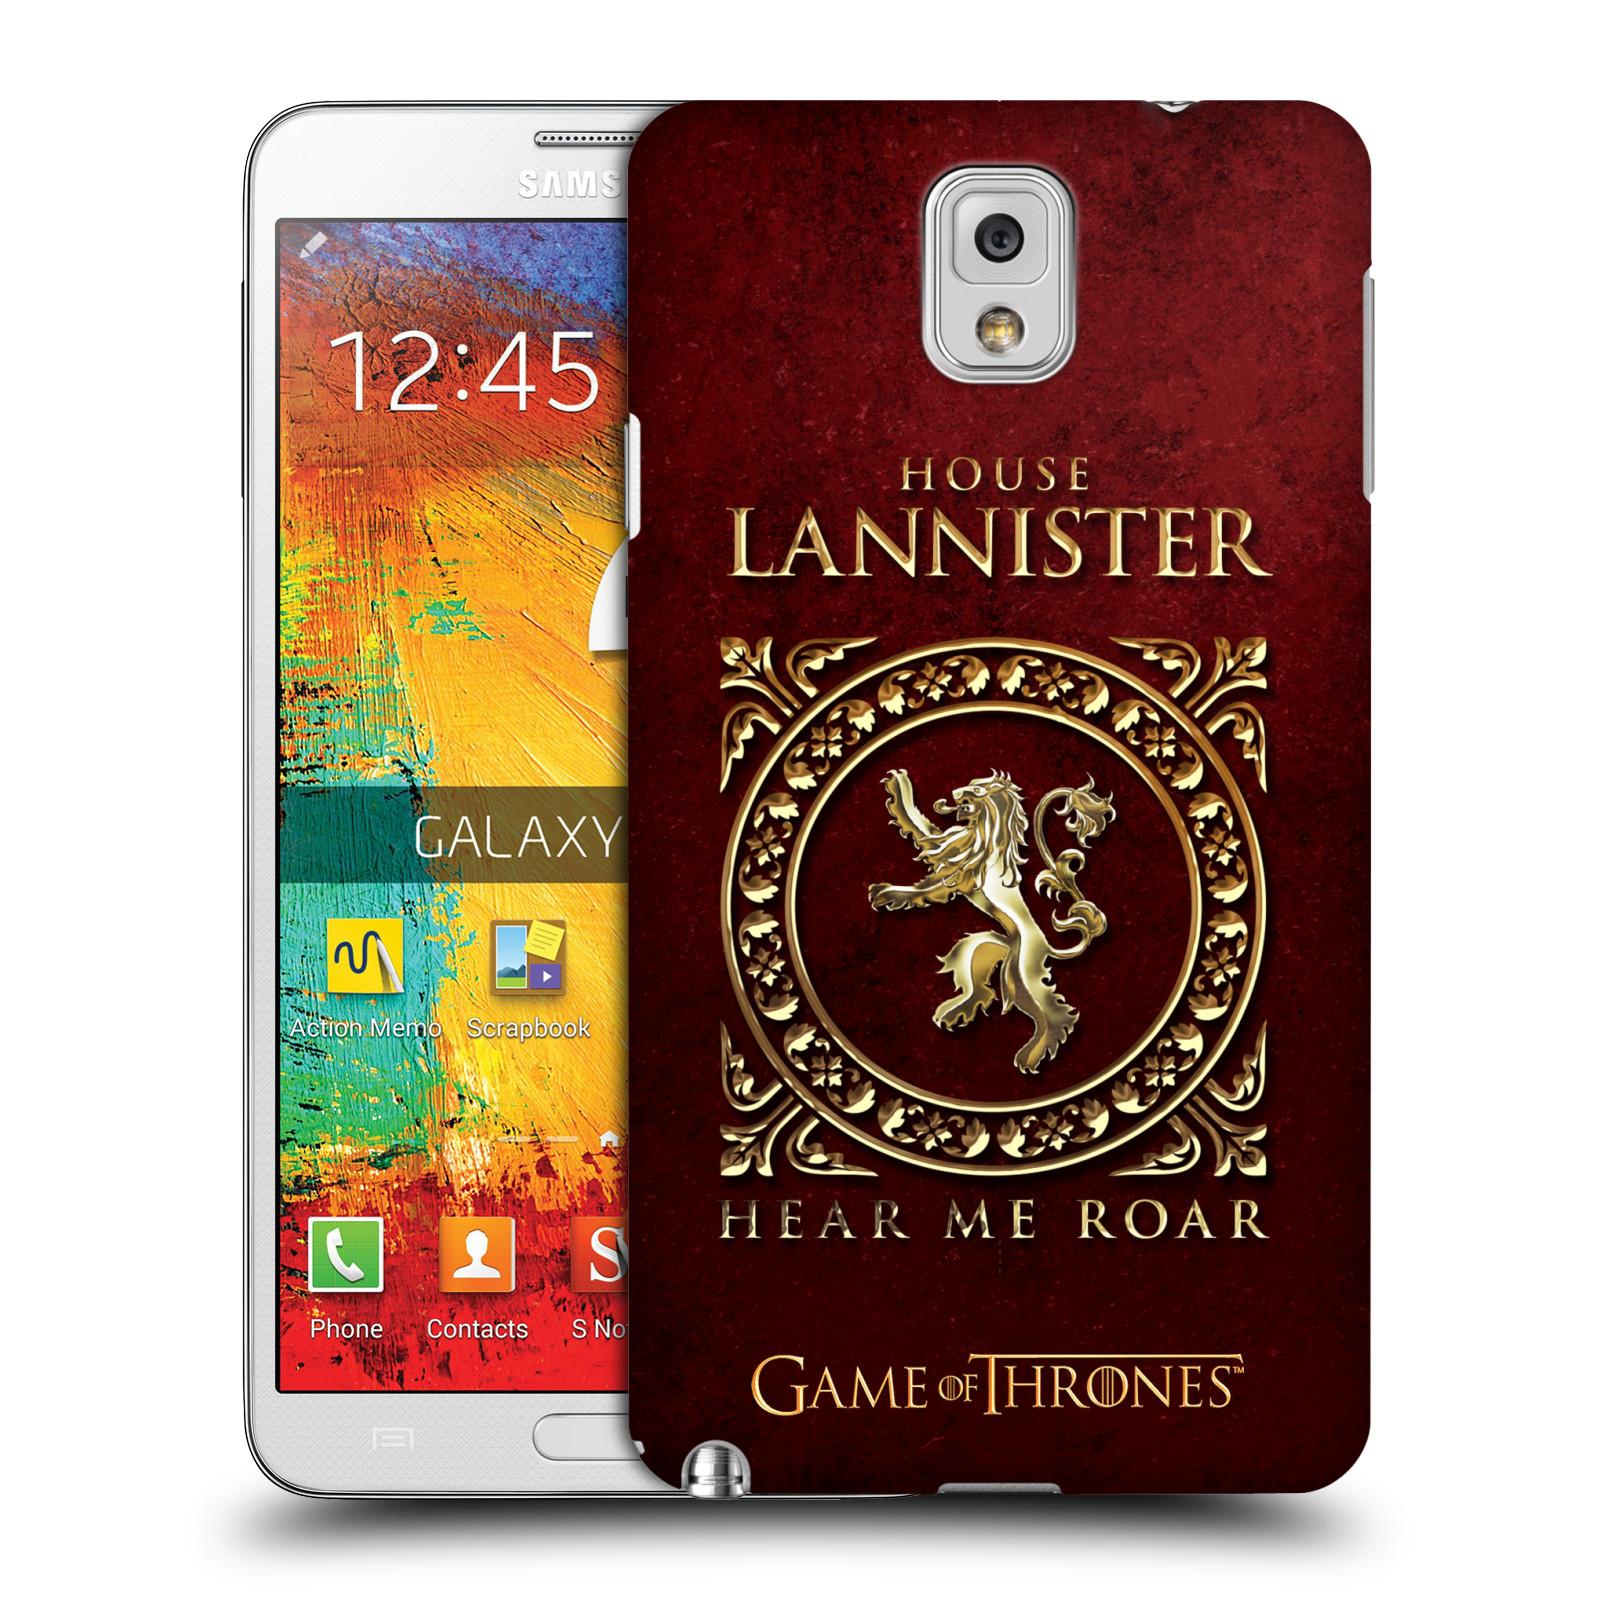 OFFICIAL-HBO-GAME-OF-THRONES-METALLIC-SIGILS-HARD-BACK-CASE-FOR-SAMSUNG-PHONES-2